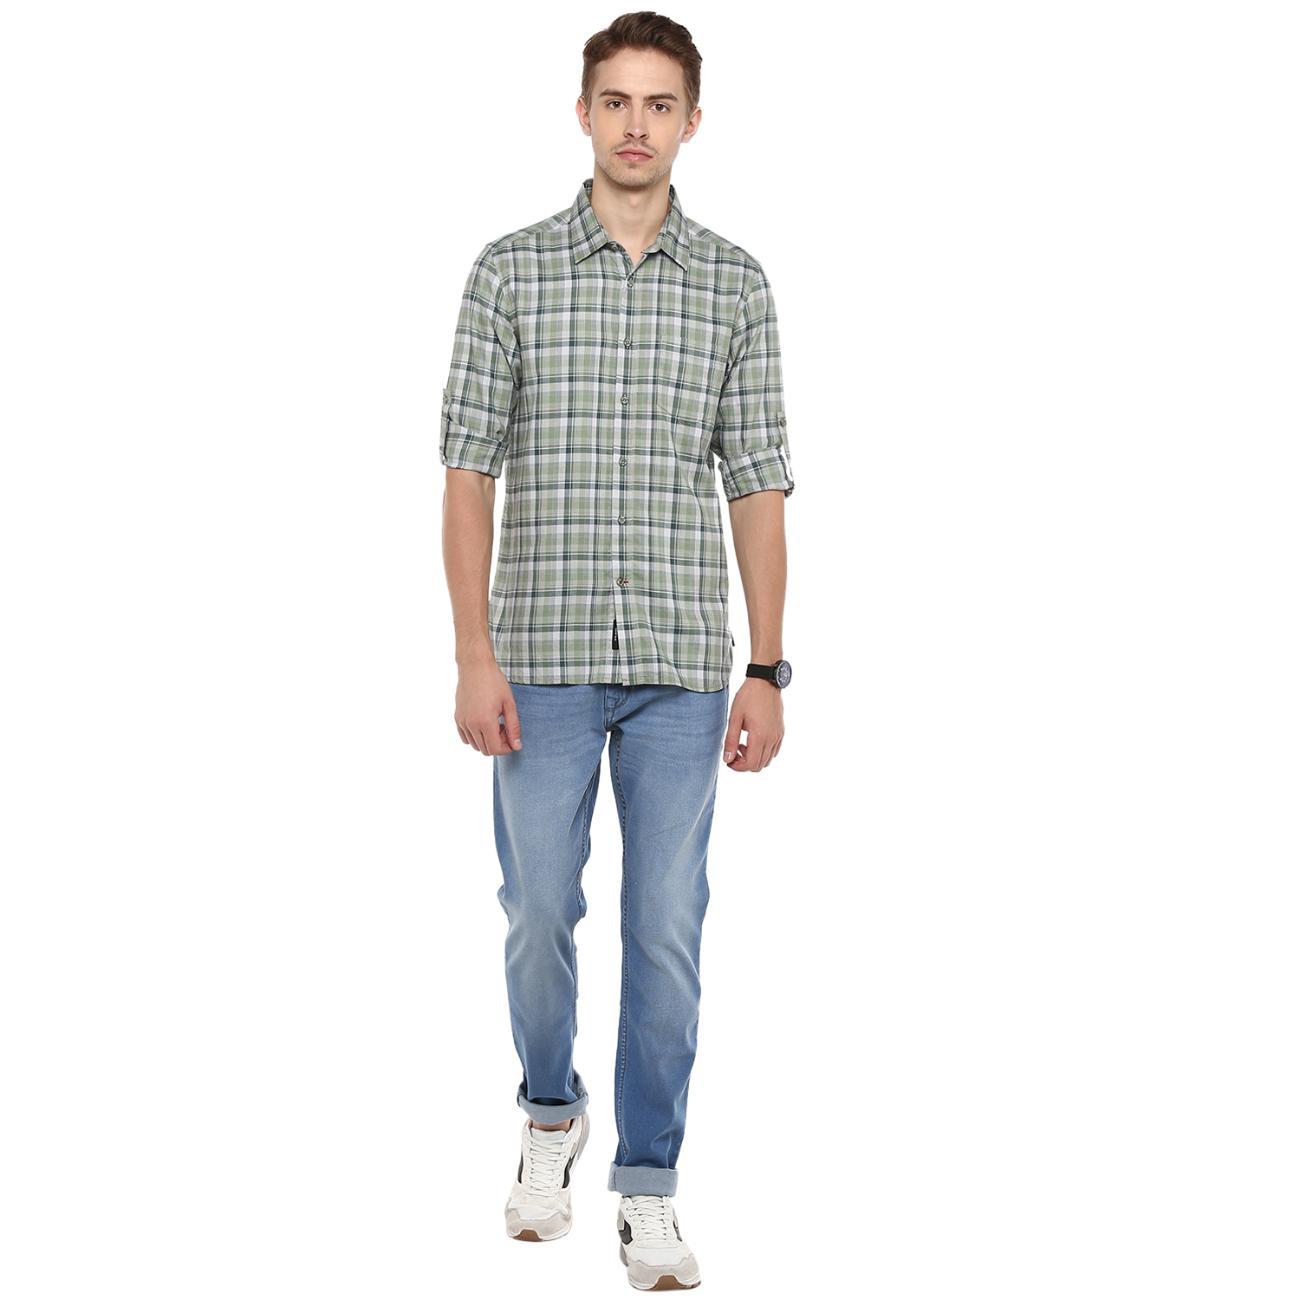 Mens Shirts Online